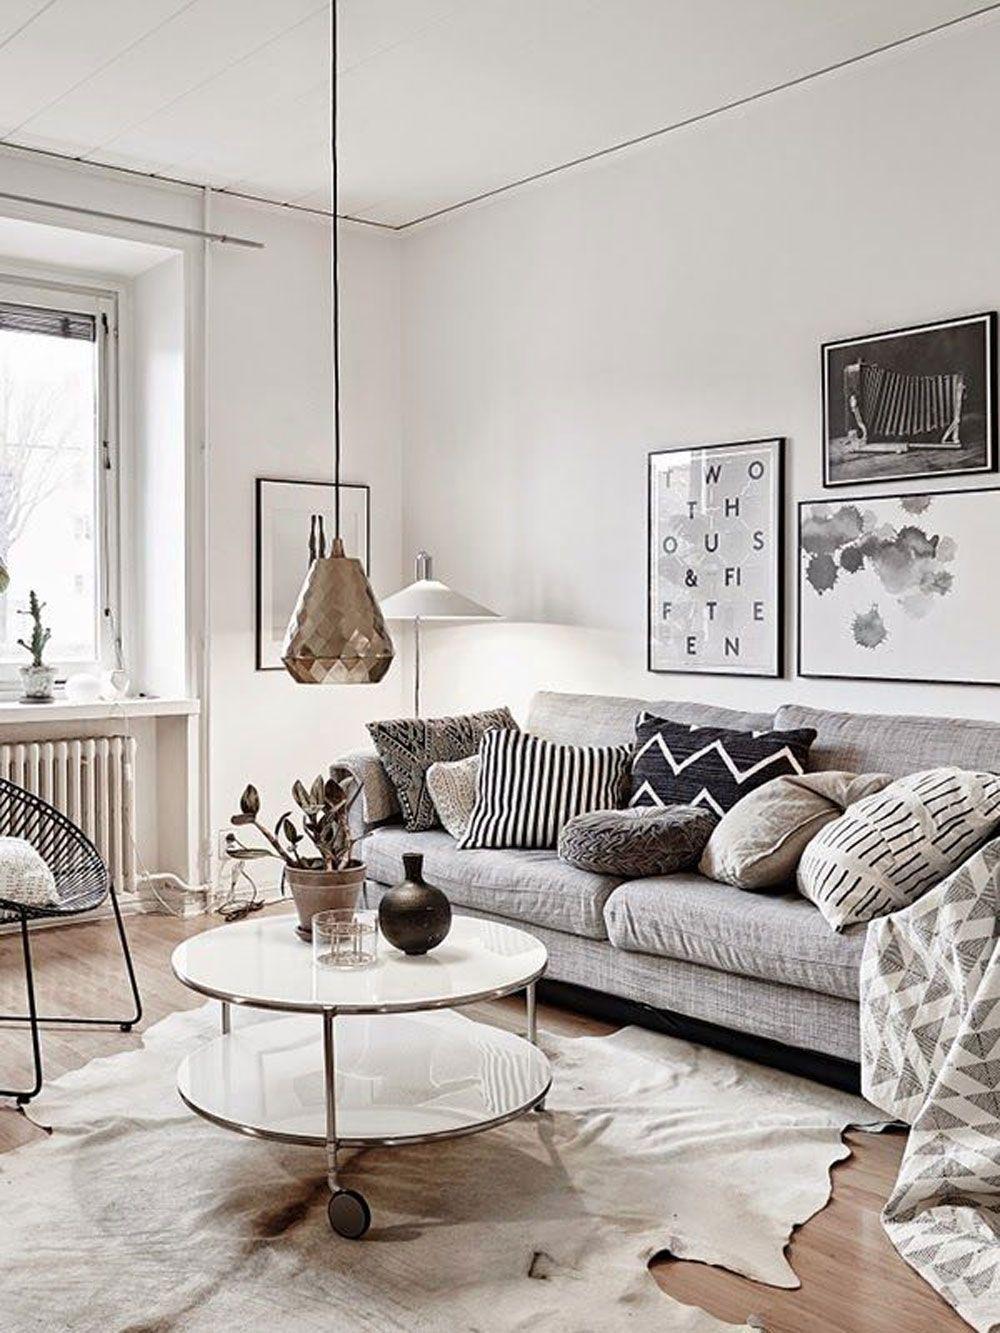 home decor inspiration elements of ellis - Home Decor Inspiration